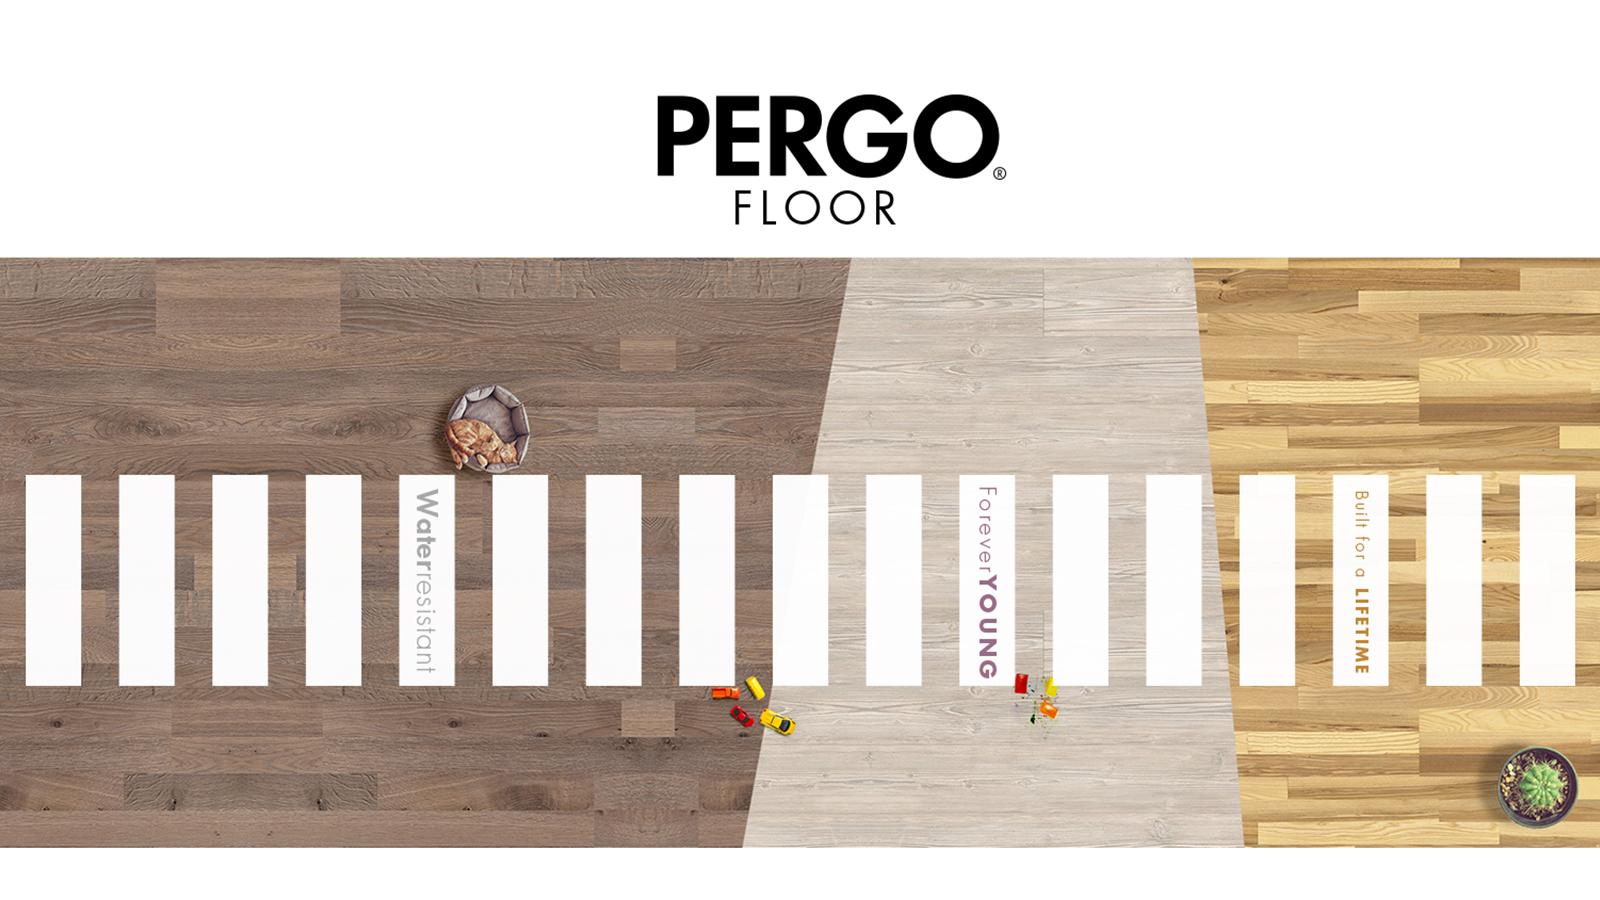 PERGO-conceptstore_0001_PERGO.jpg